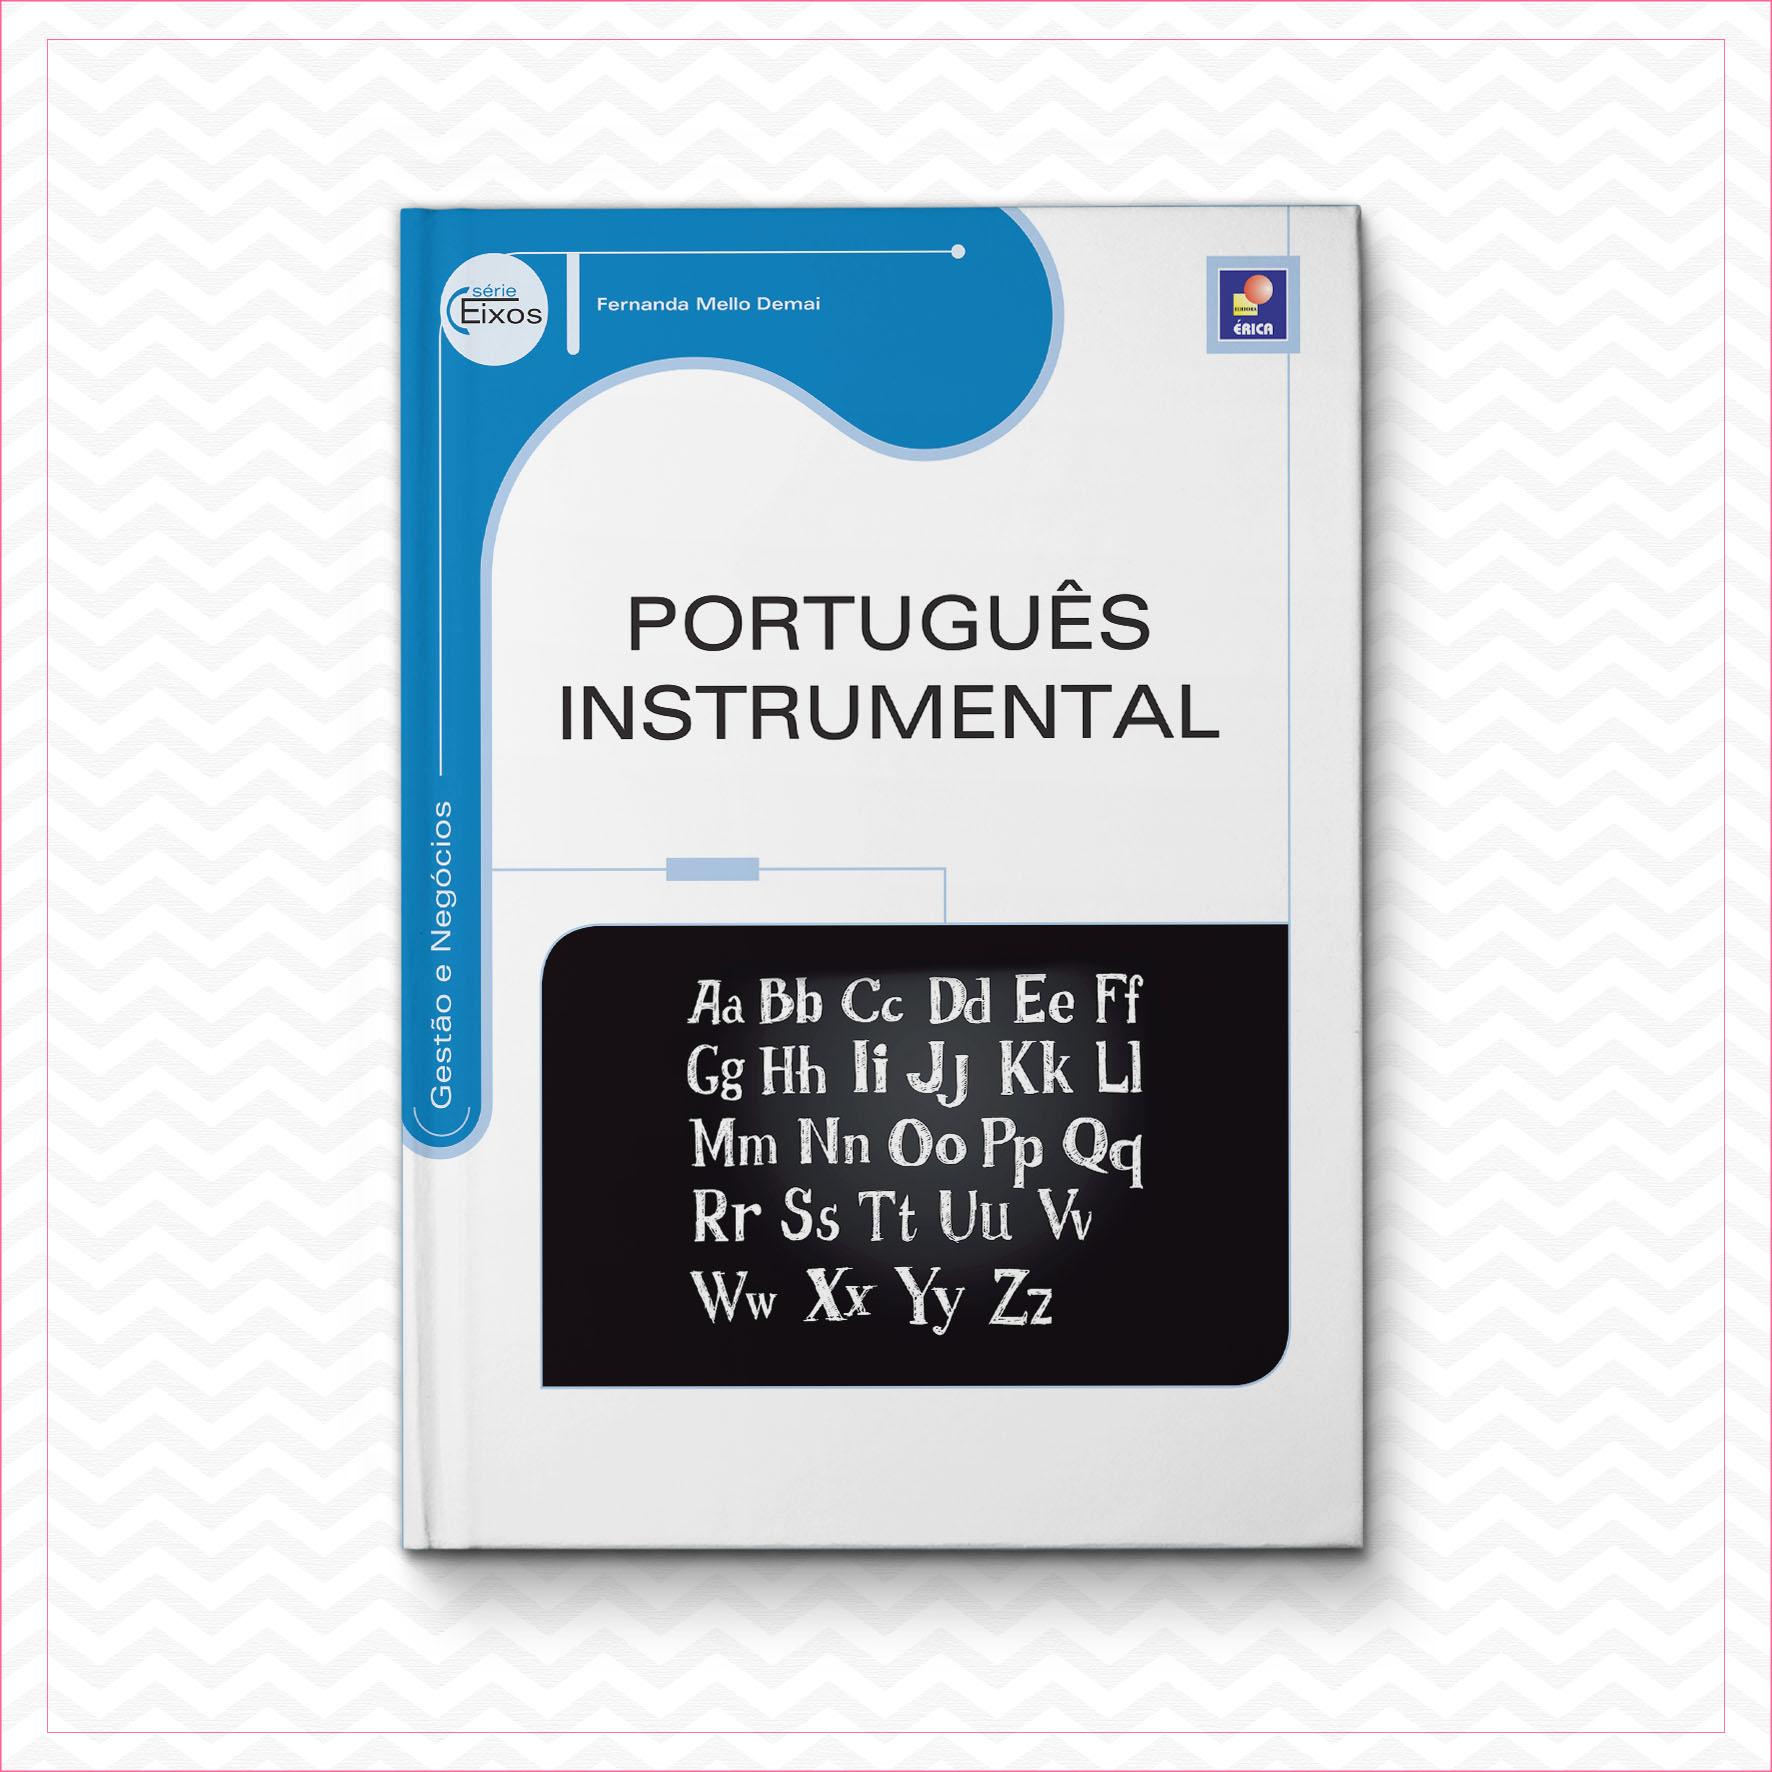 Português instrumental – Fernanda Mello Demai